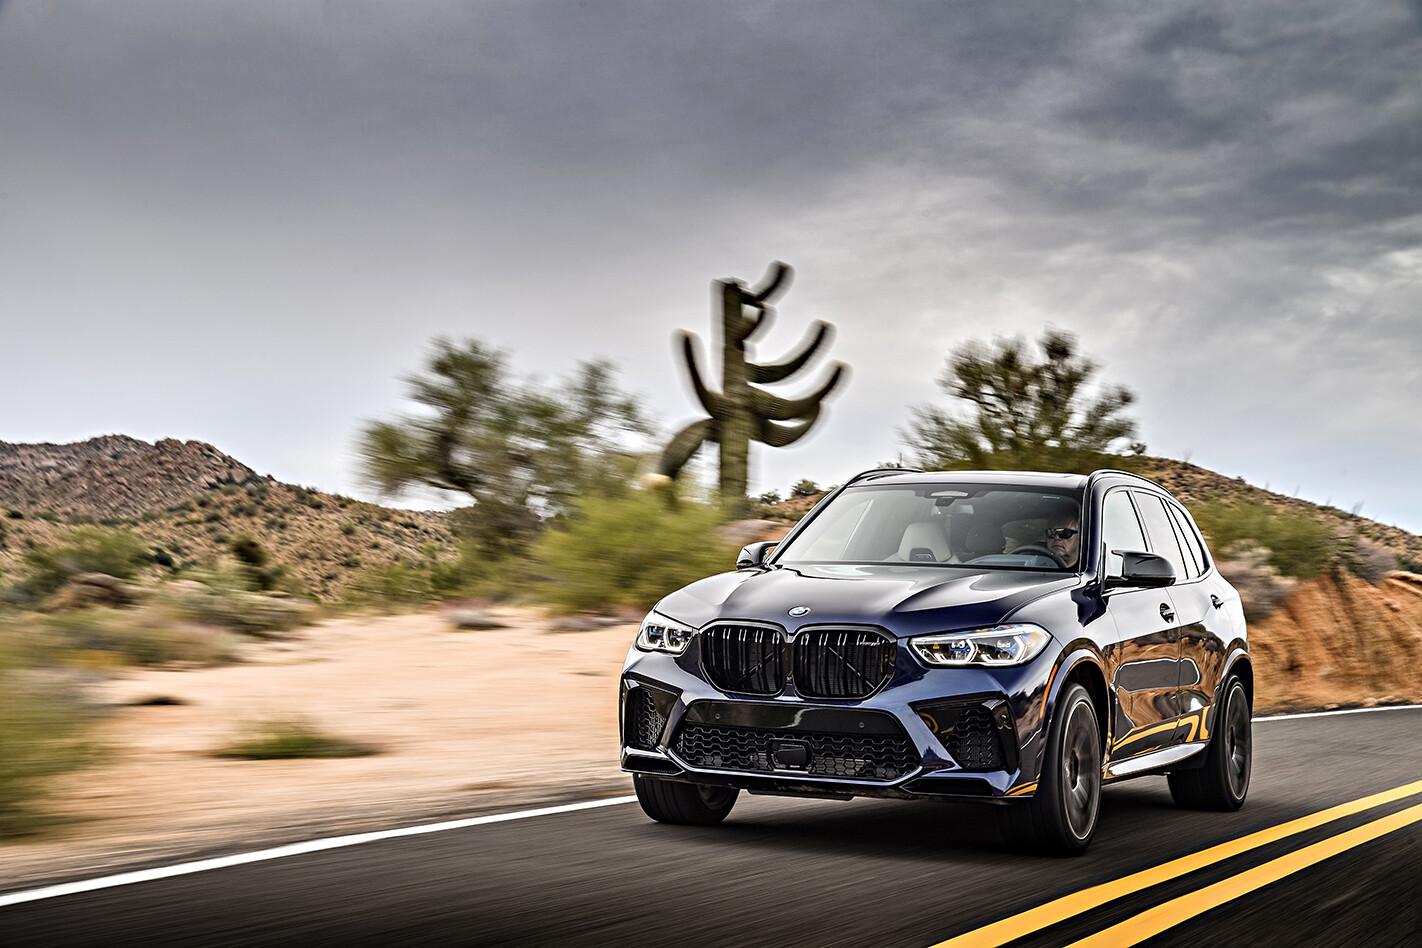 2020 BMW X5M Tranzanite Blue